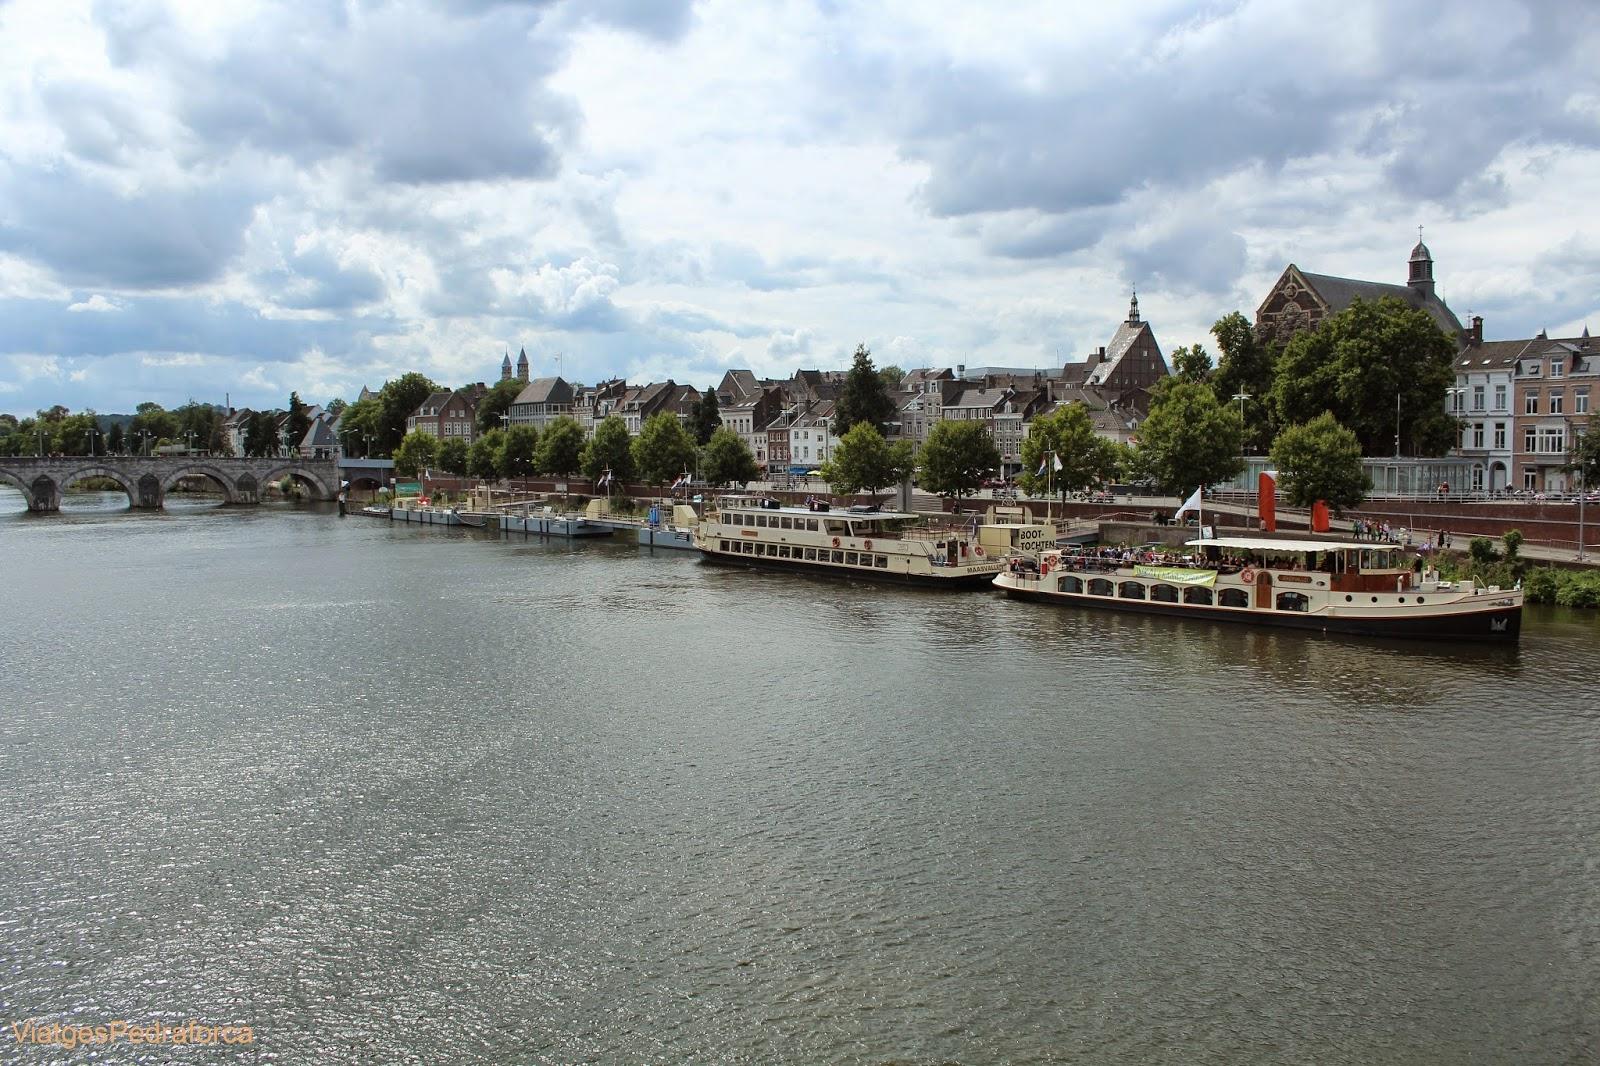 Maastricht Països Baixos riu Mosa